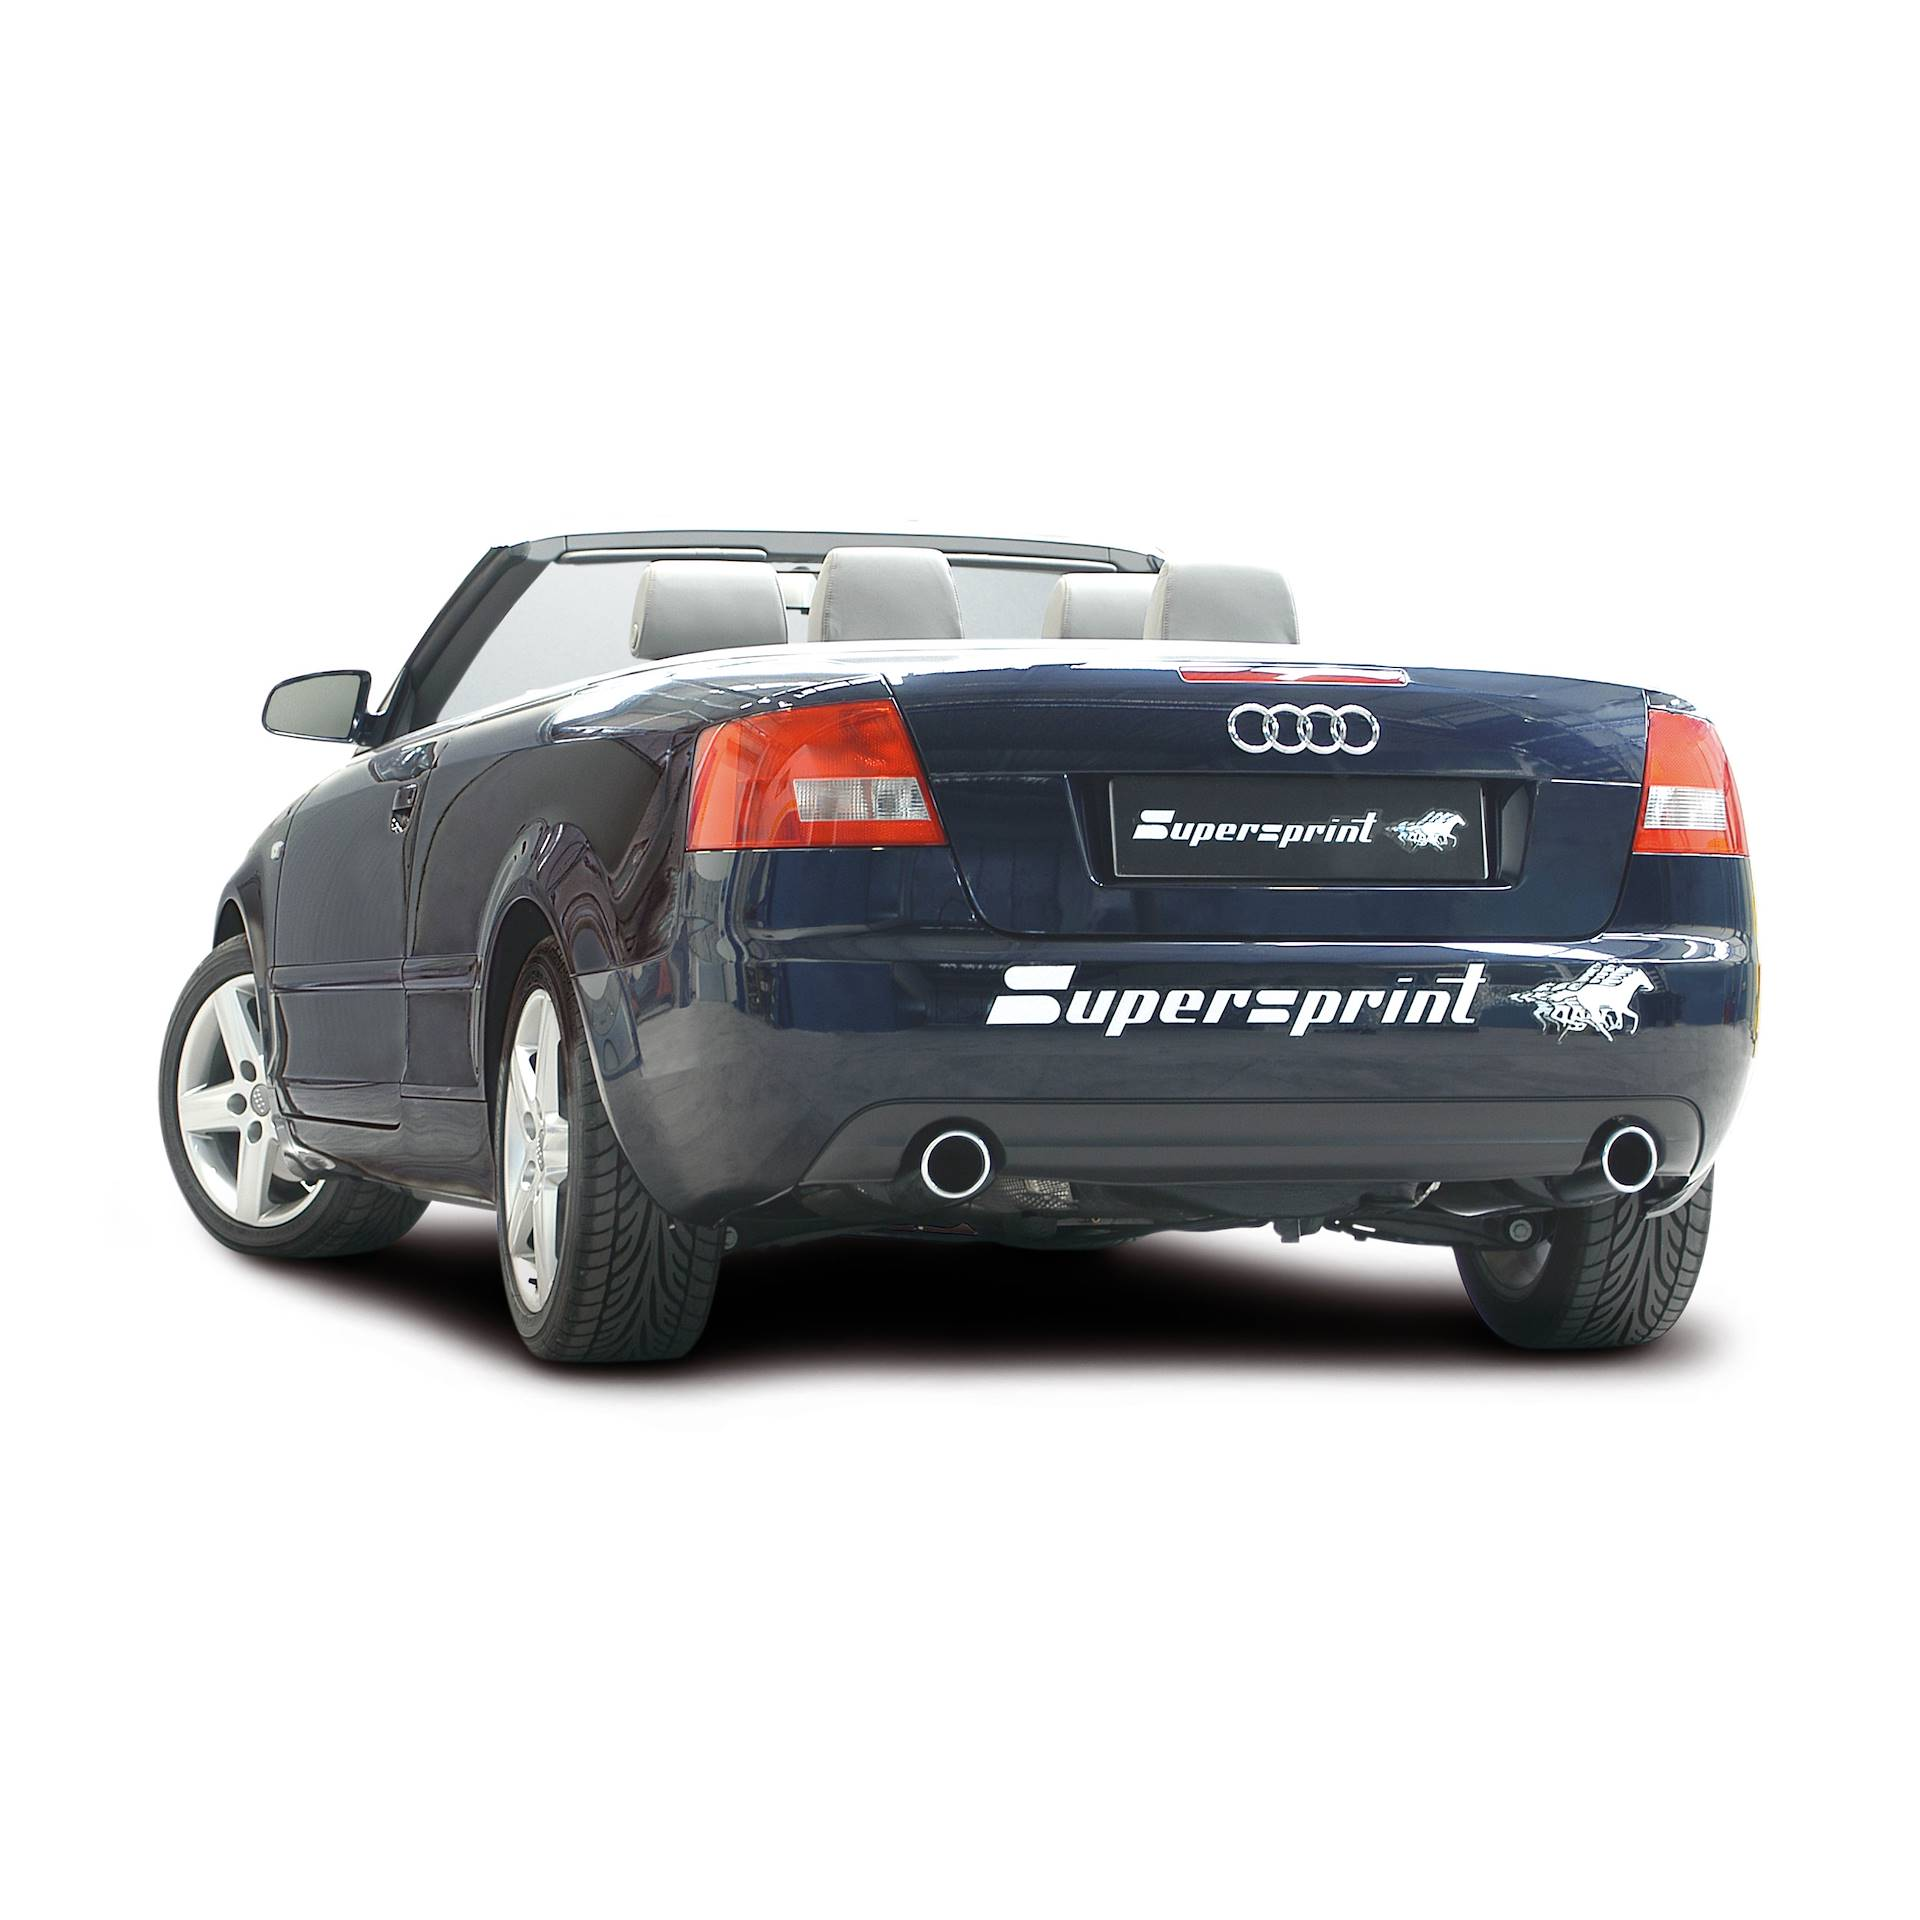 Audi A4 Cabrio 24i V6 170 Hp 03 06 Audi Exhaust Systems